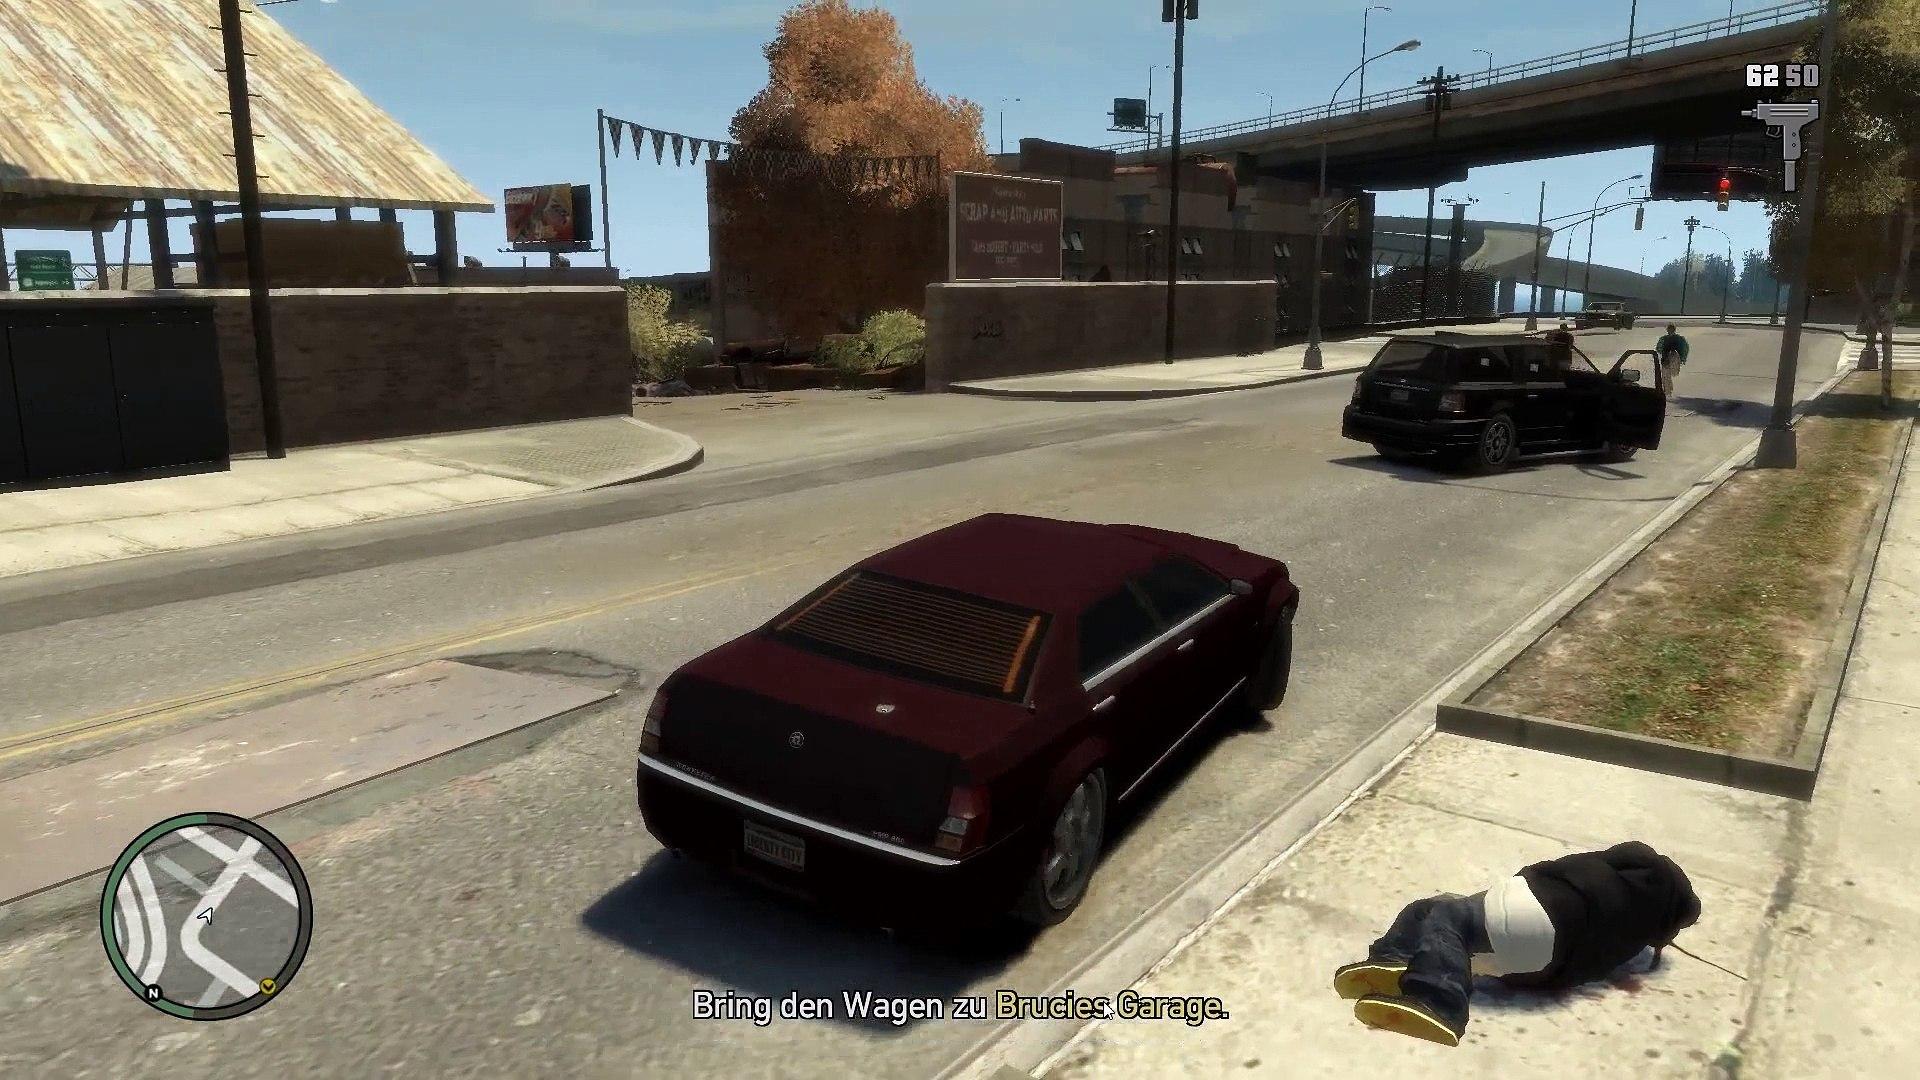 GTA IV Stealing a car for Brucie (GTA IV gameplay by BurnTyre Films)